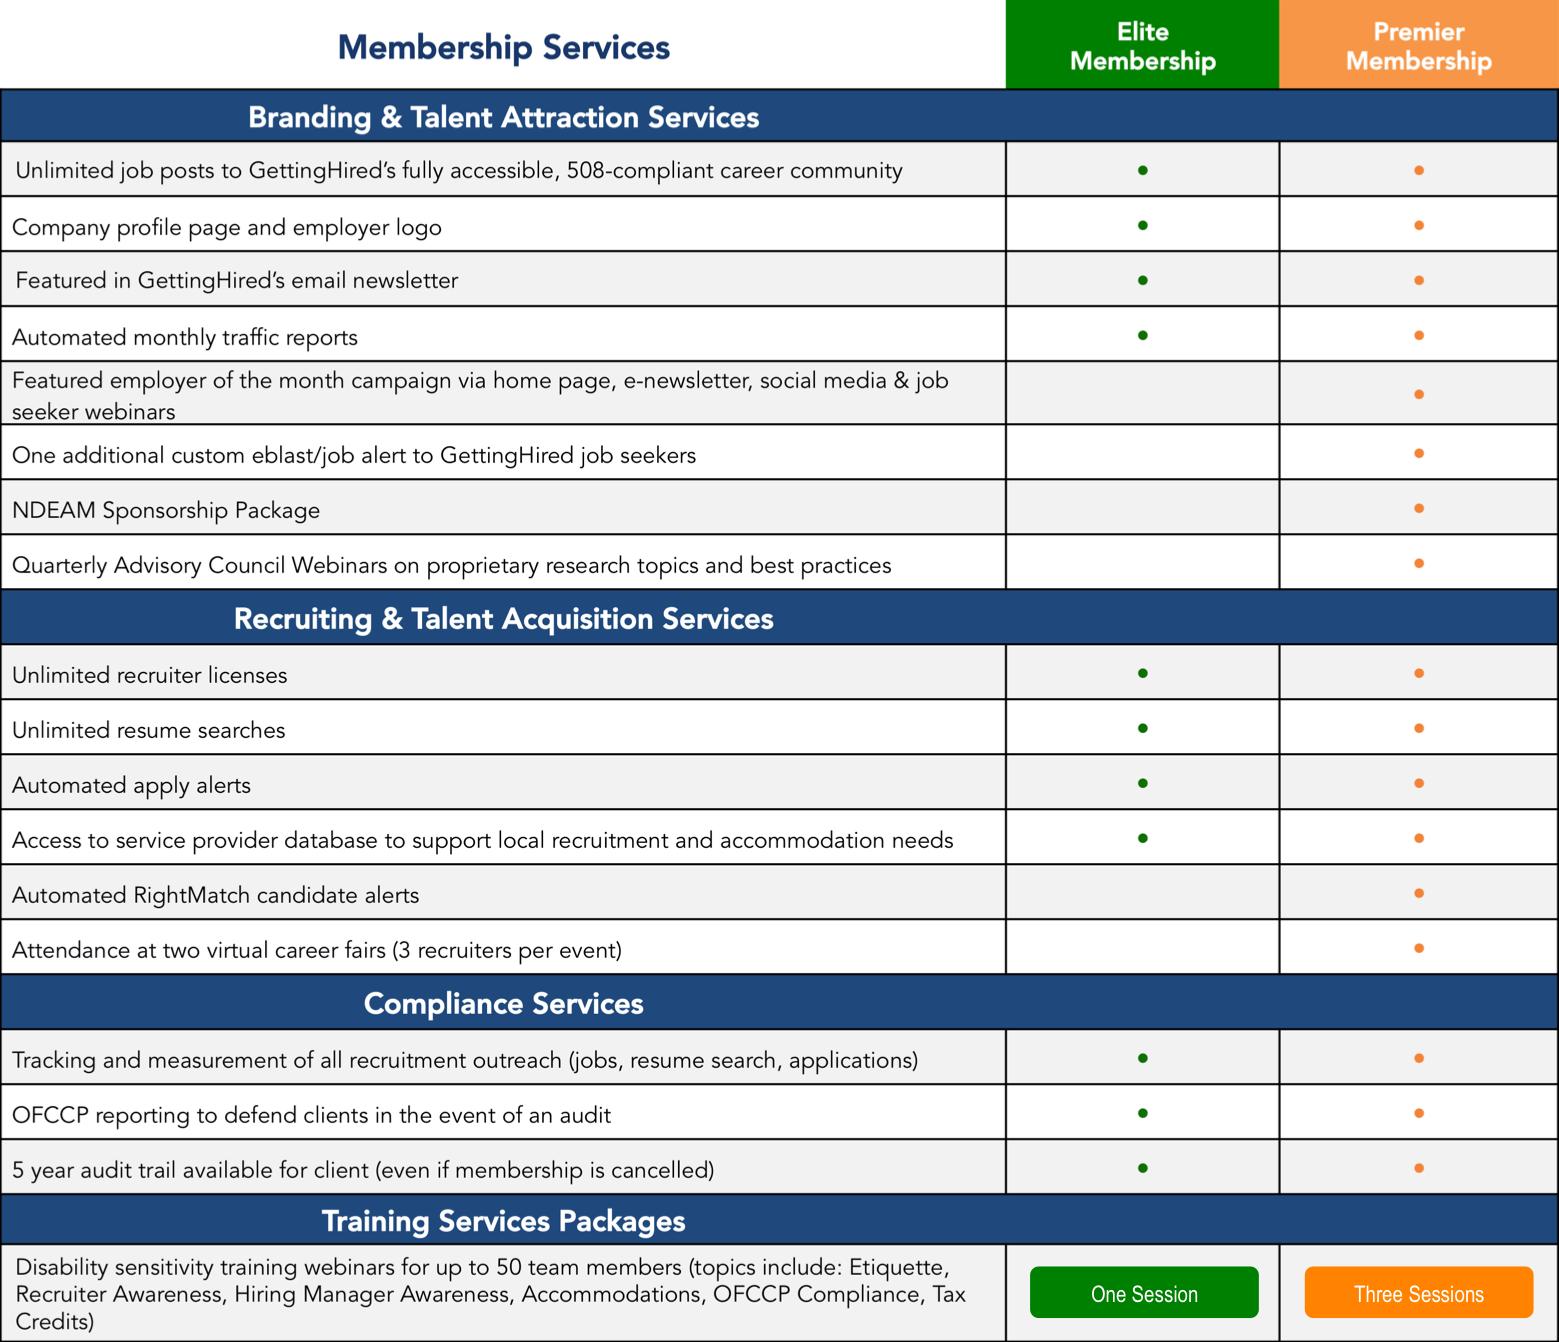 Employer Membership Program Options